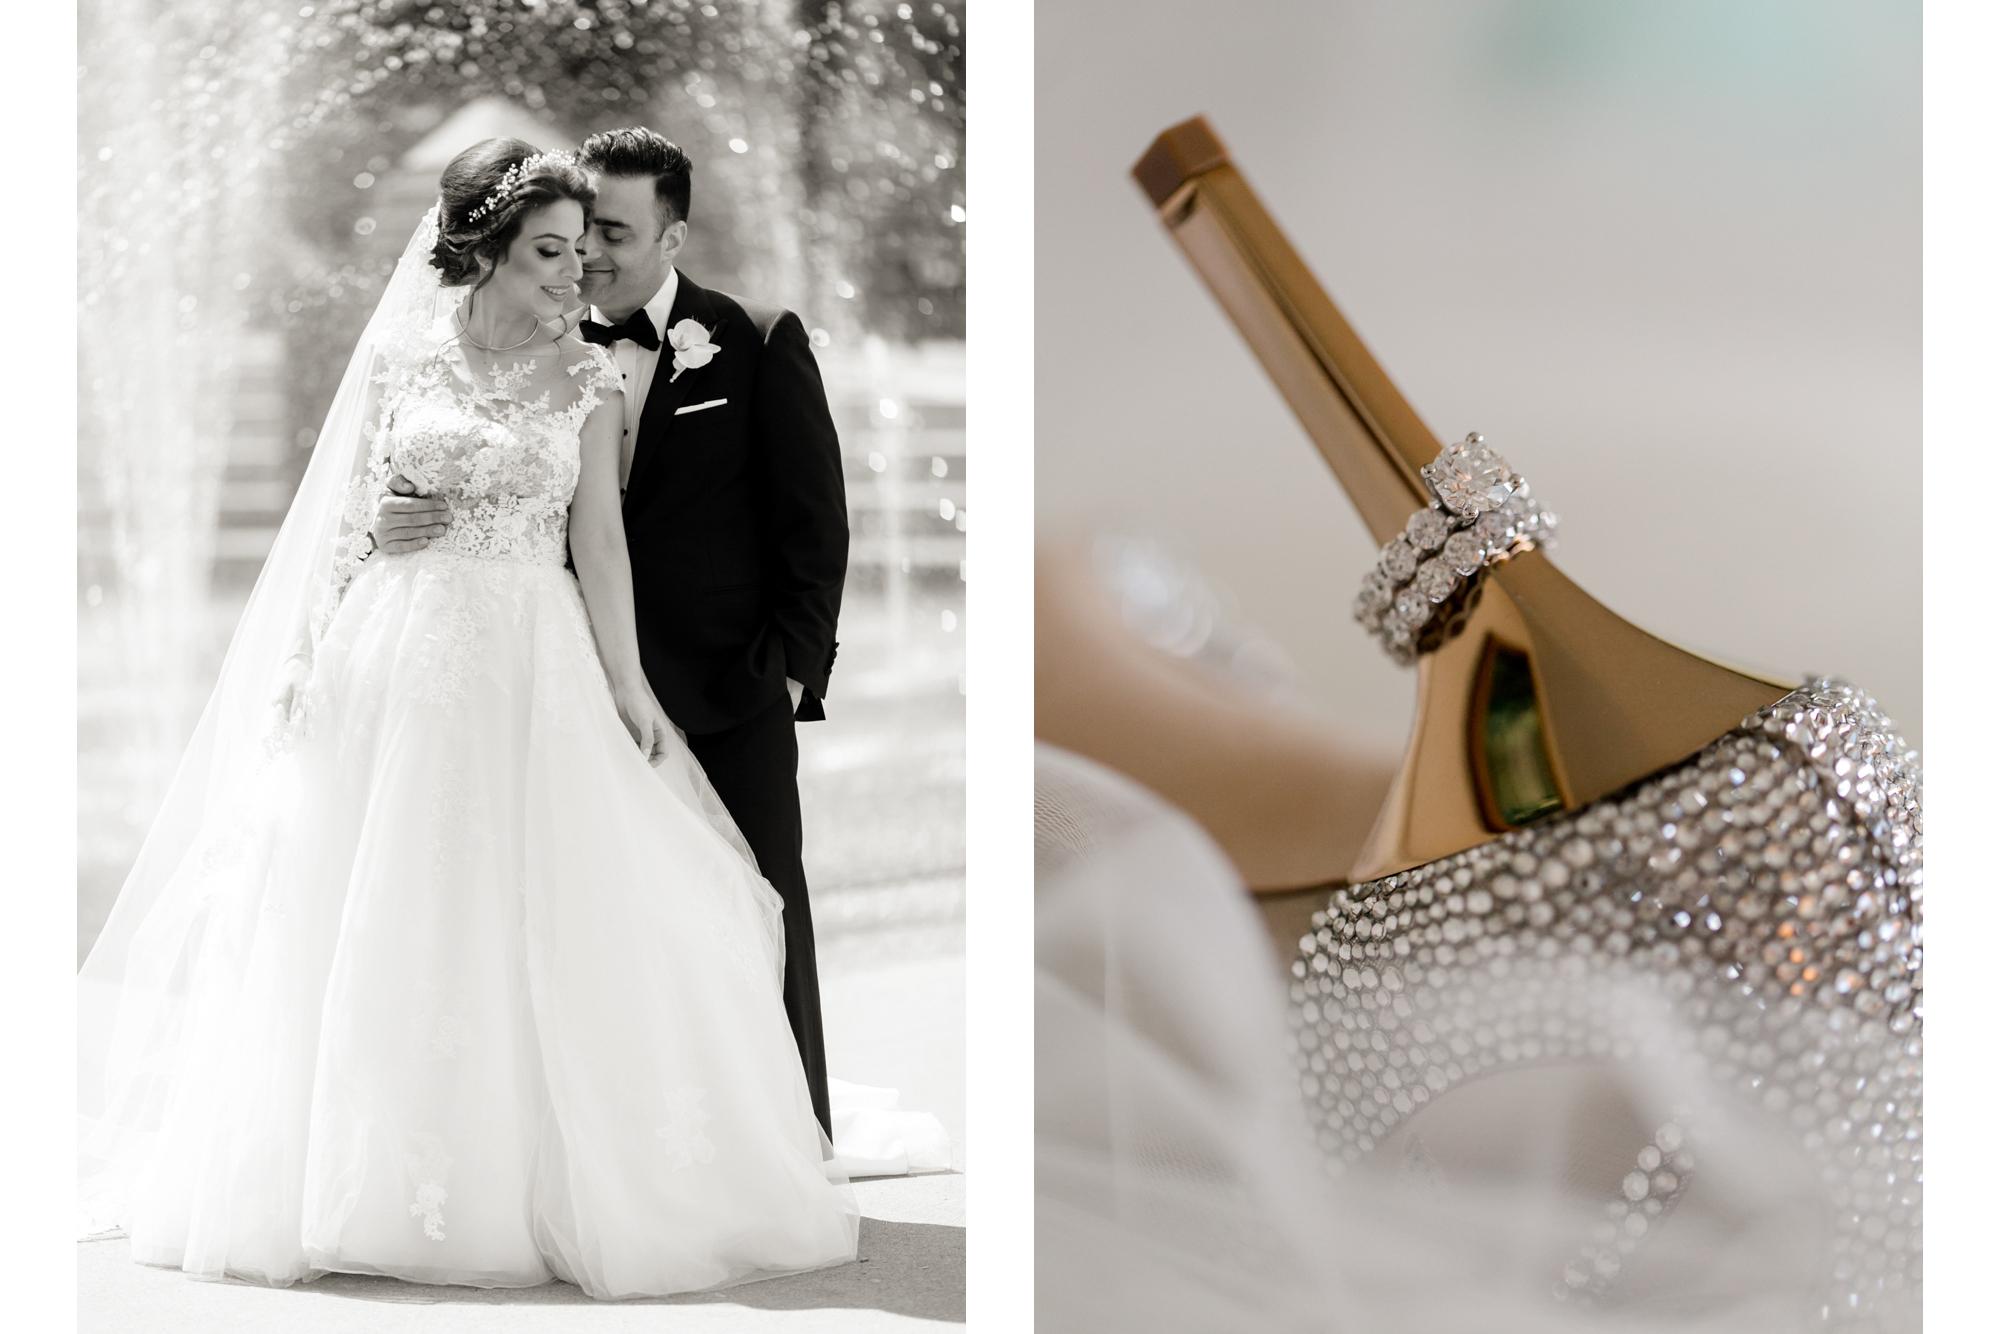 vancouver-luxury-wedding-photographer-lori-miles-28.jpg